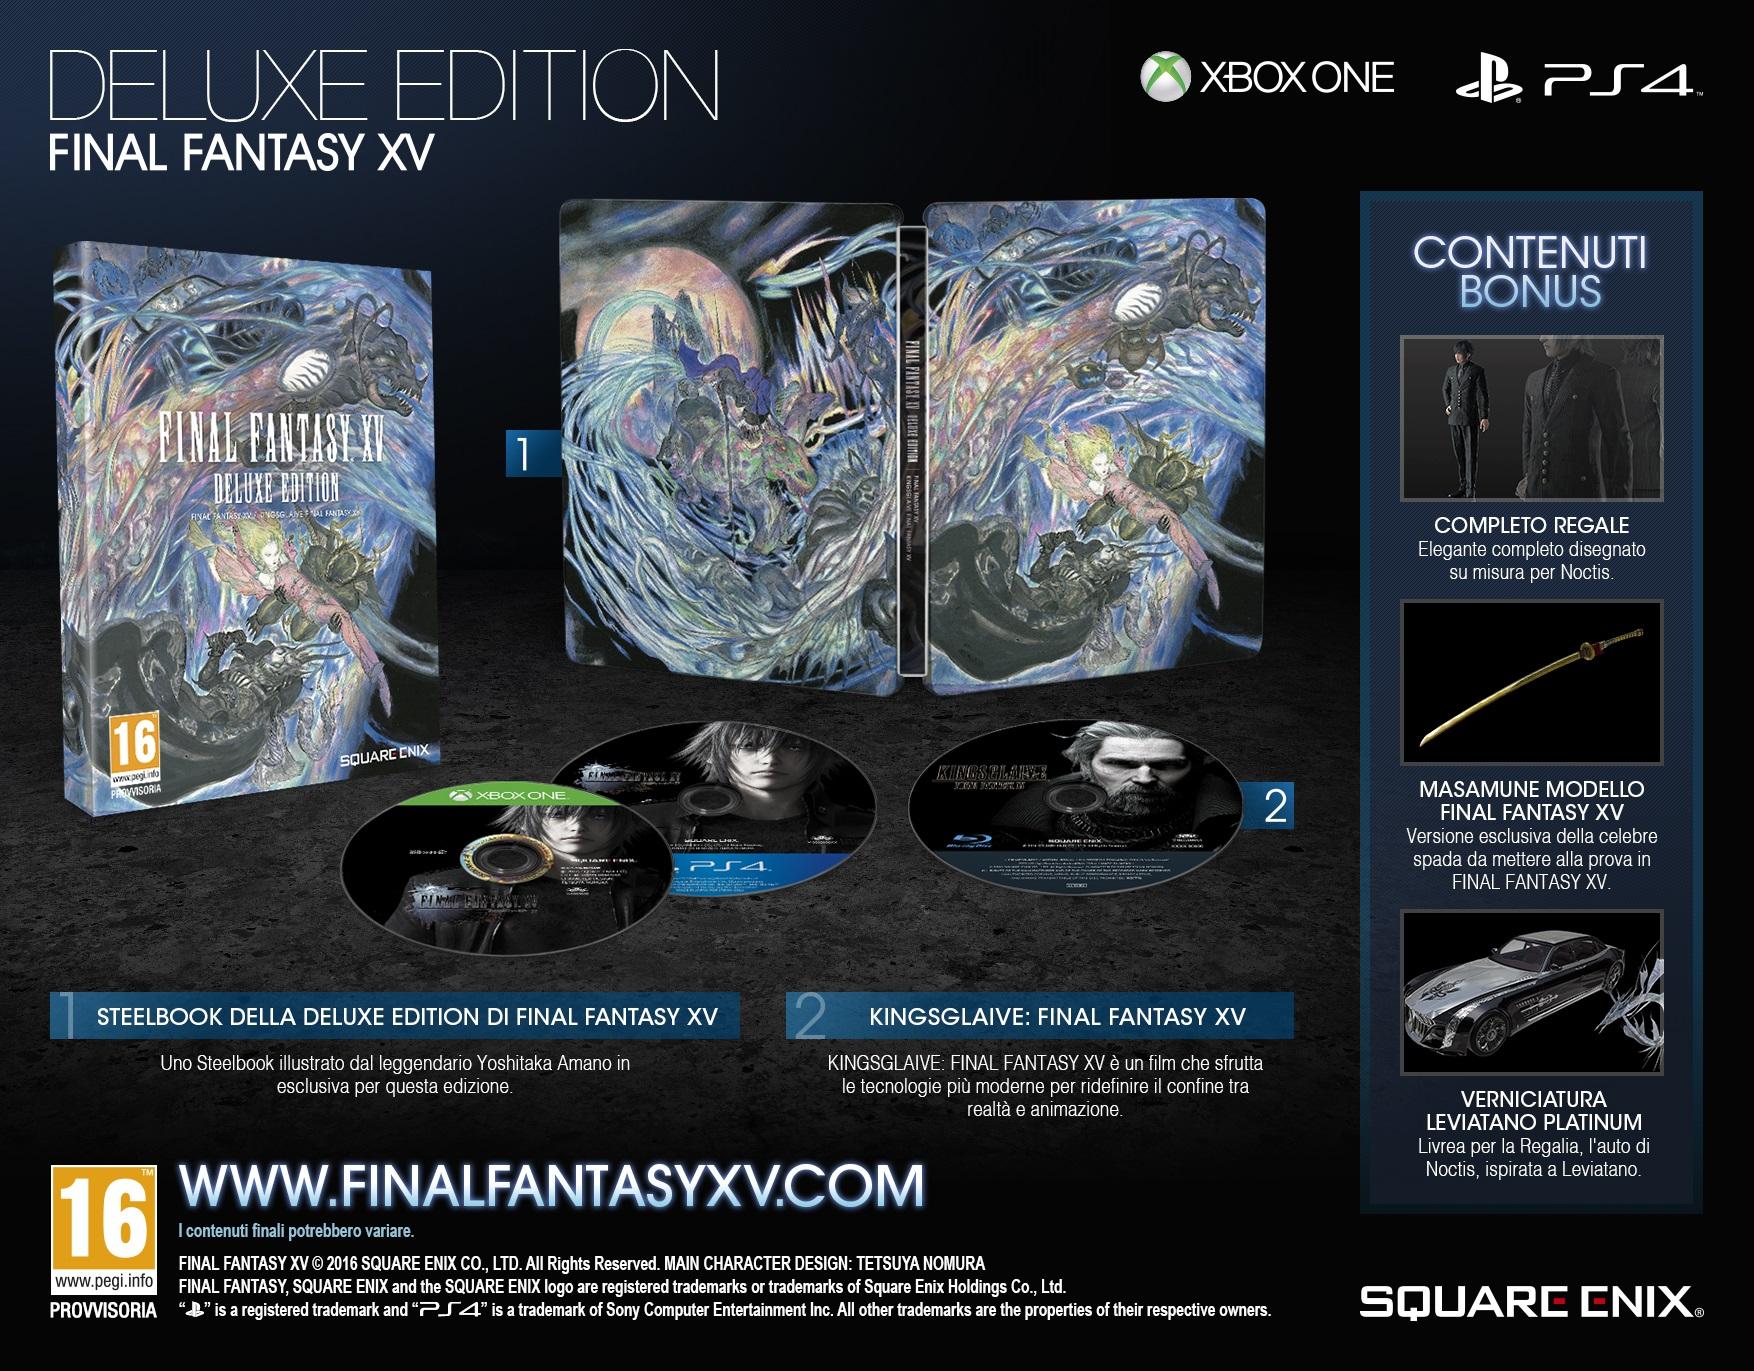 Final Fantasy XV: Deluxe Edition